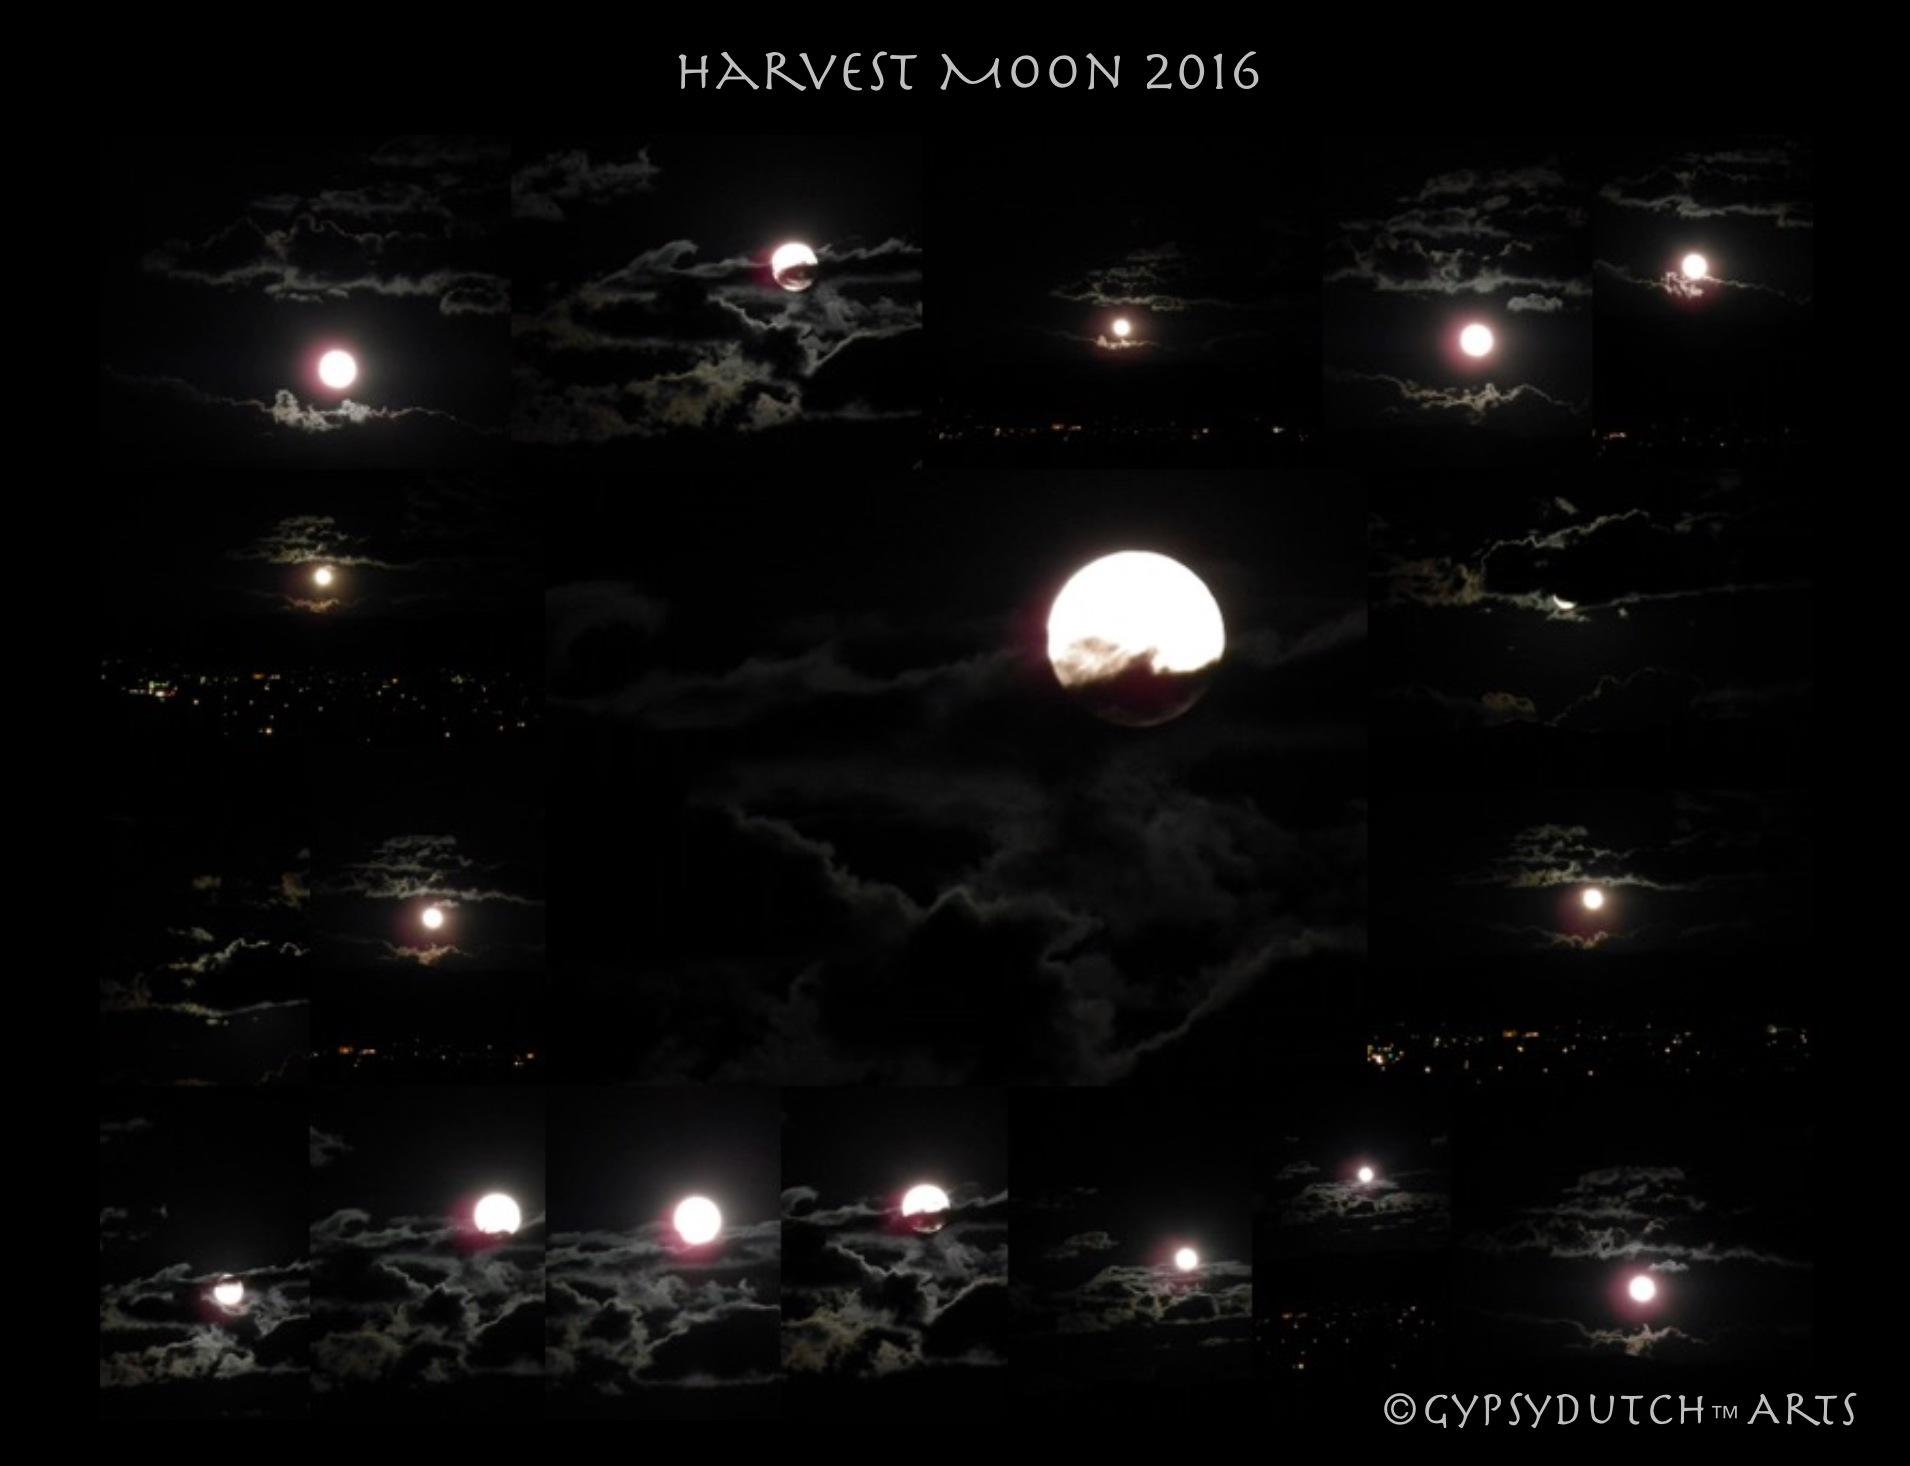 Harvest Moon 2016 Collage by GypsyDutch